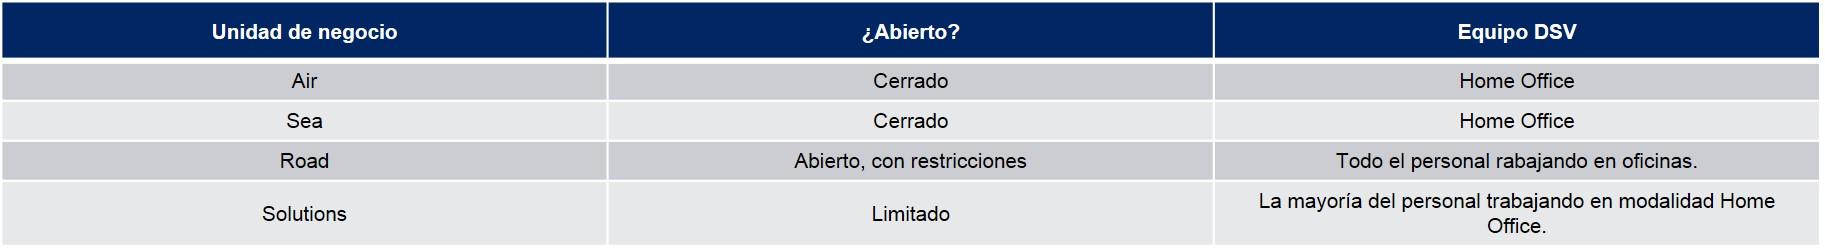 Tabla Operaciones República Dominicana COVID-19 03-04-20